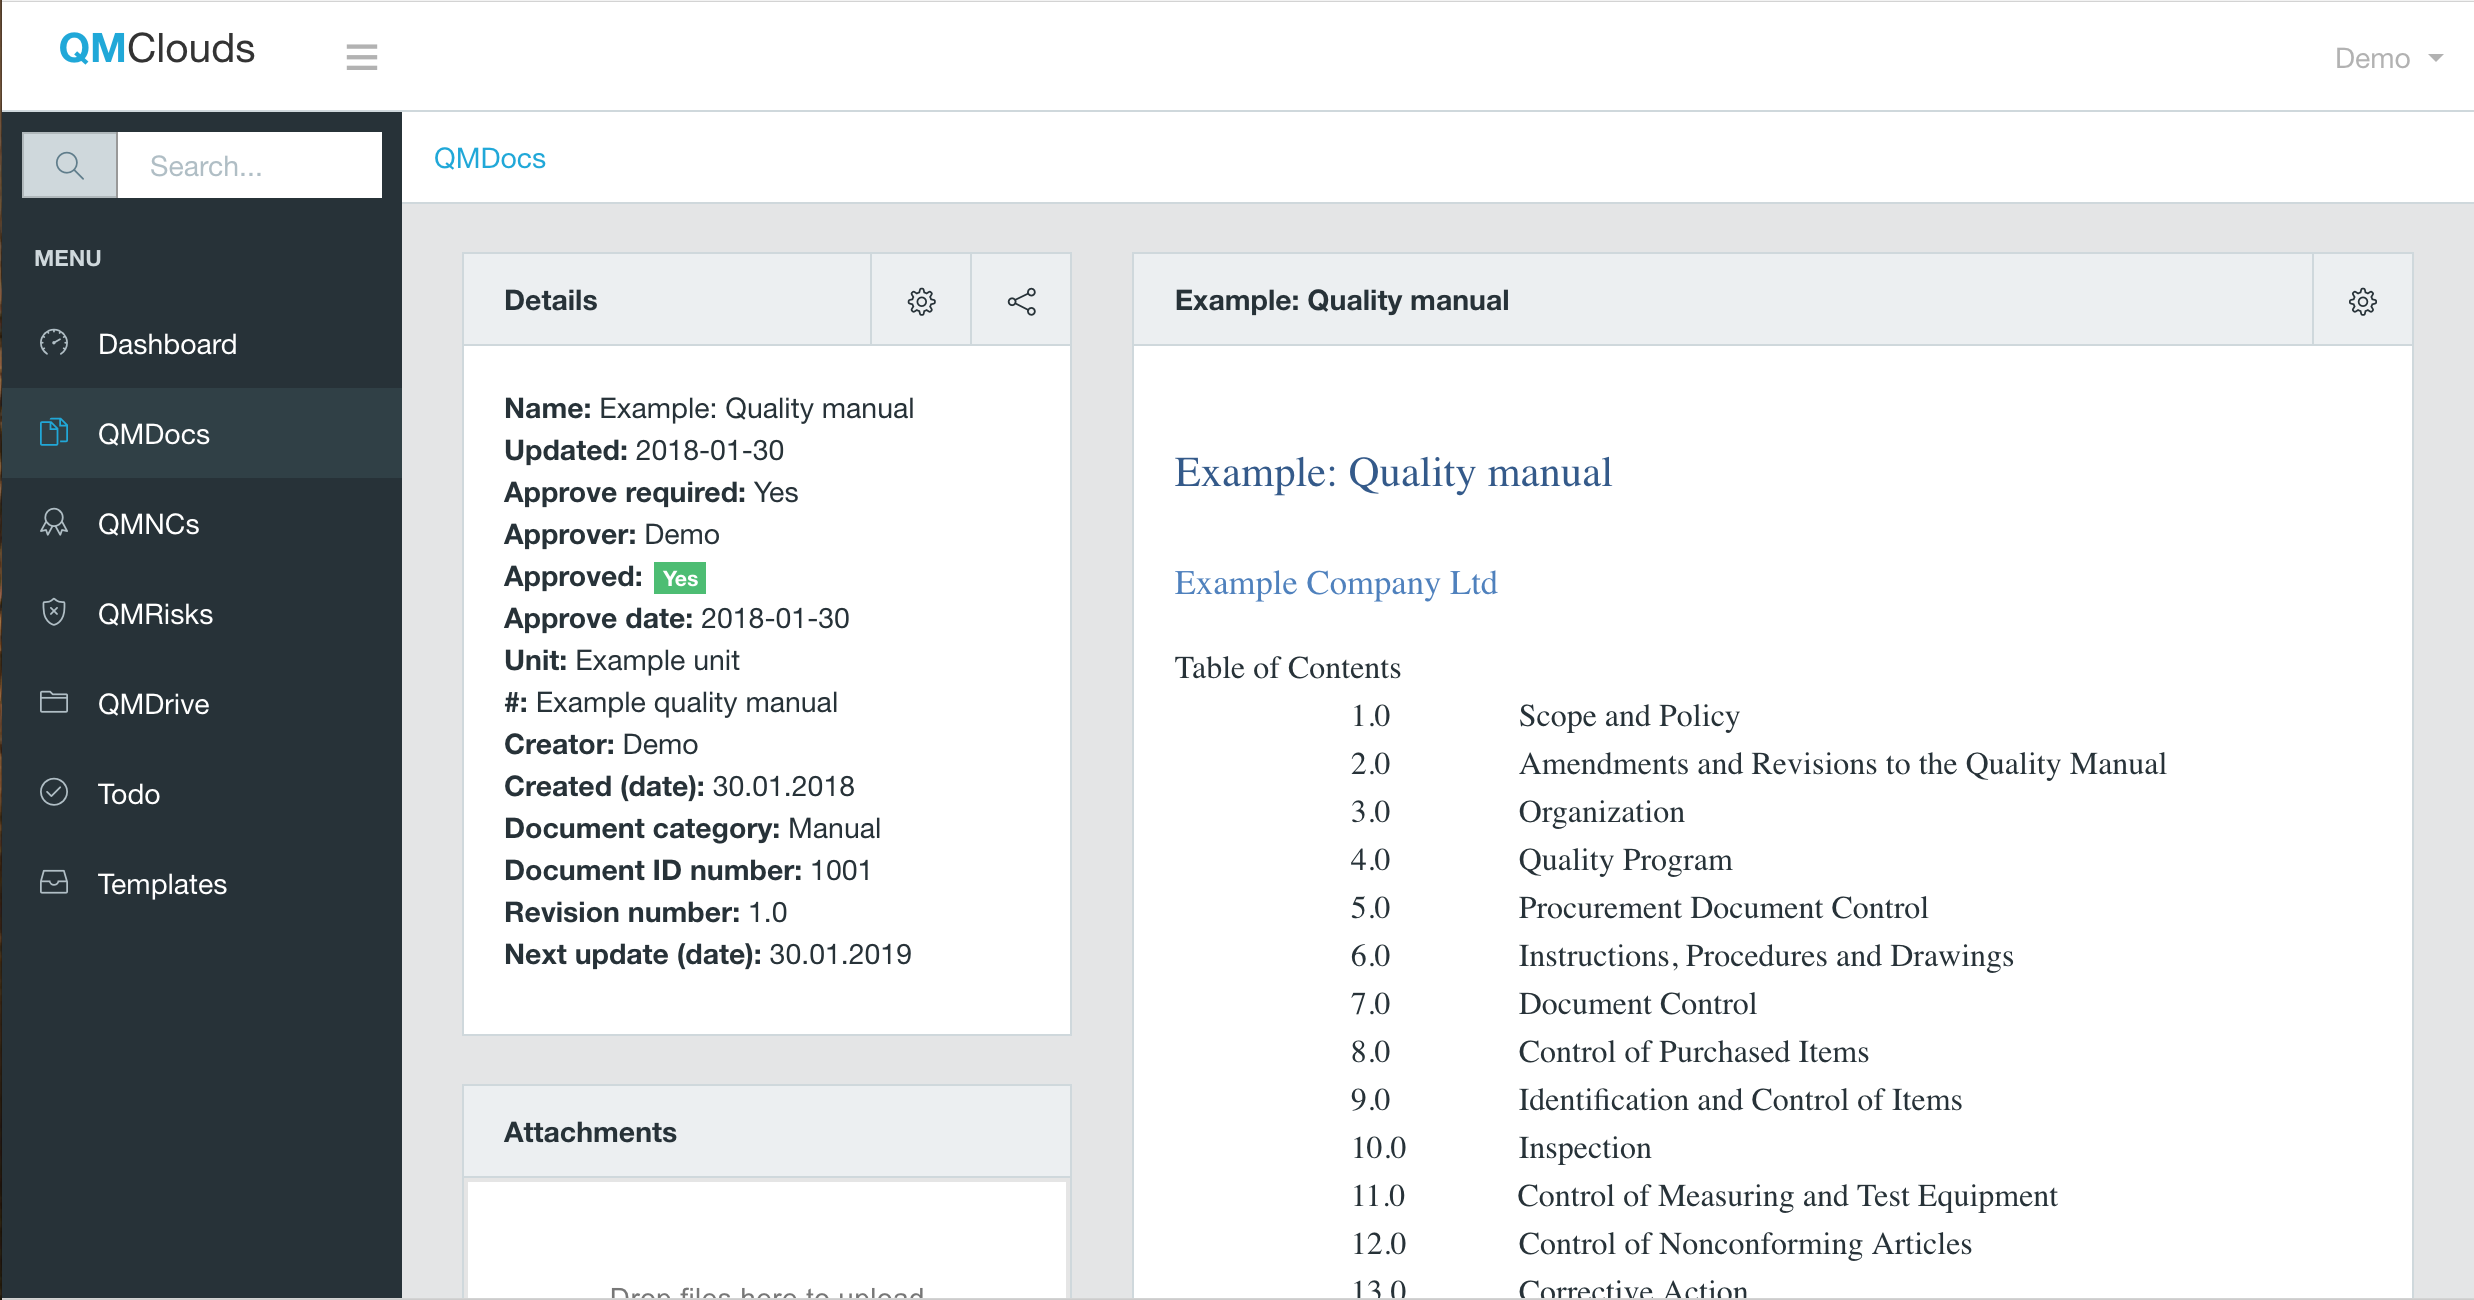 QMClouds Software - Document management